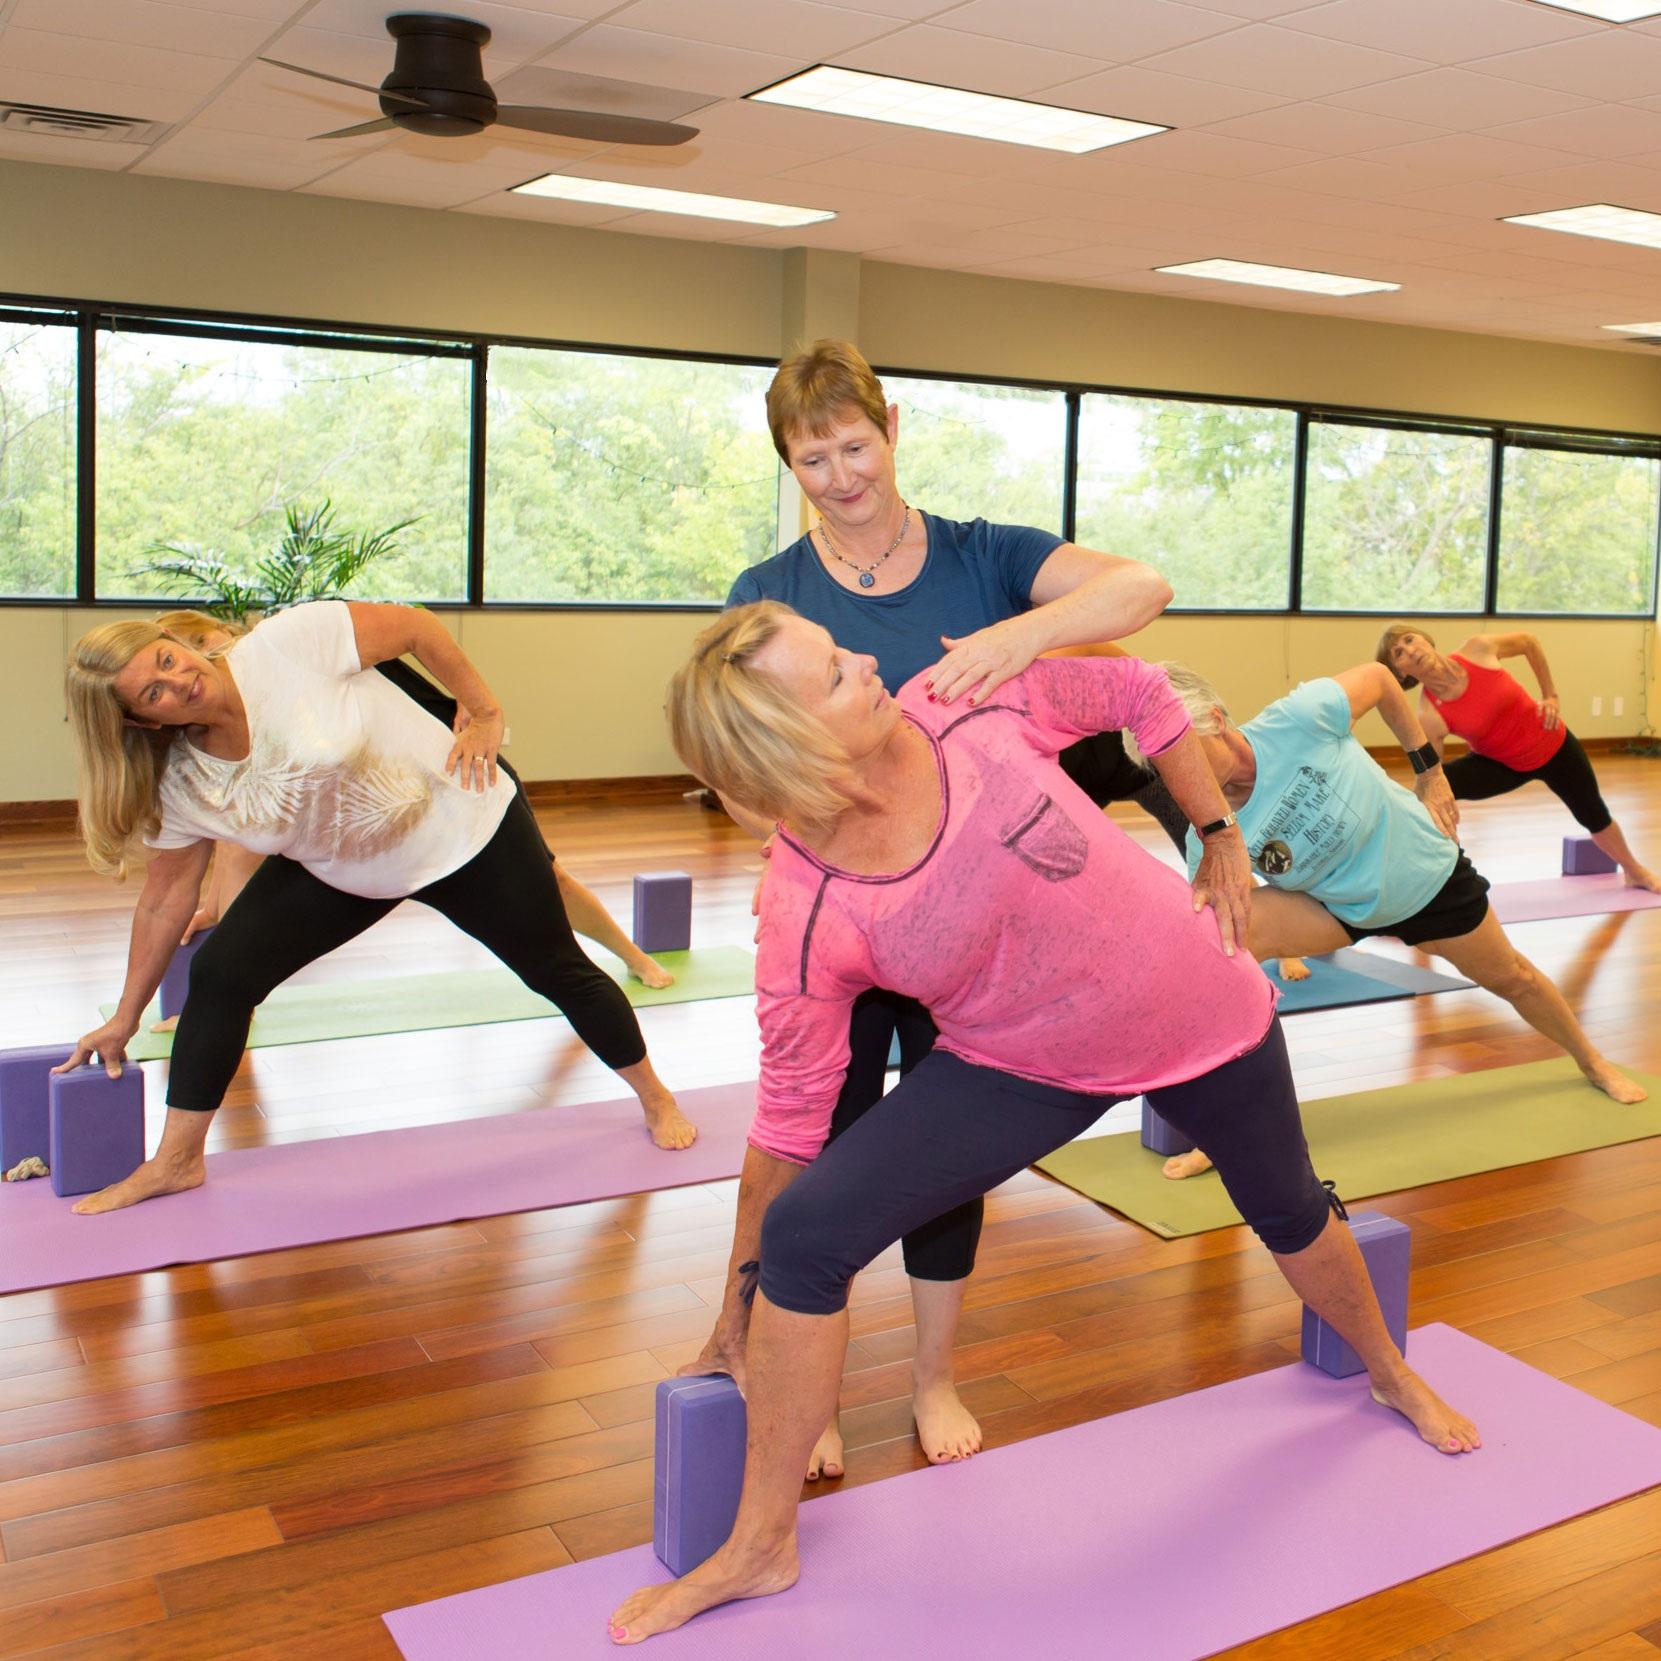 head-to-toe-yoga-2017-10-ret.jpg